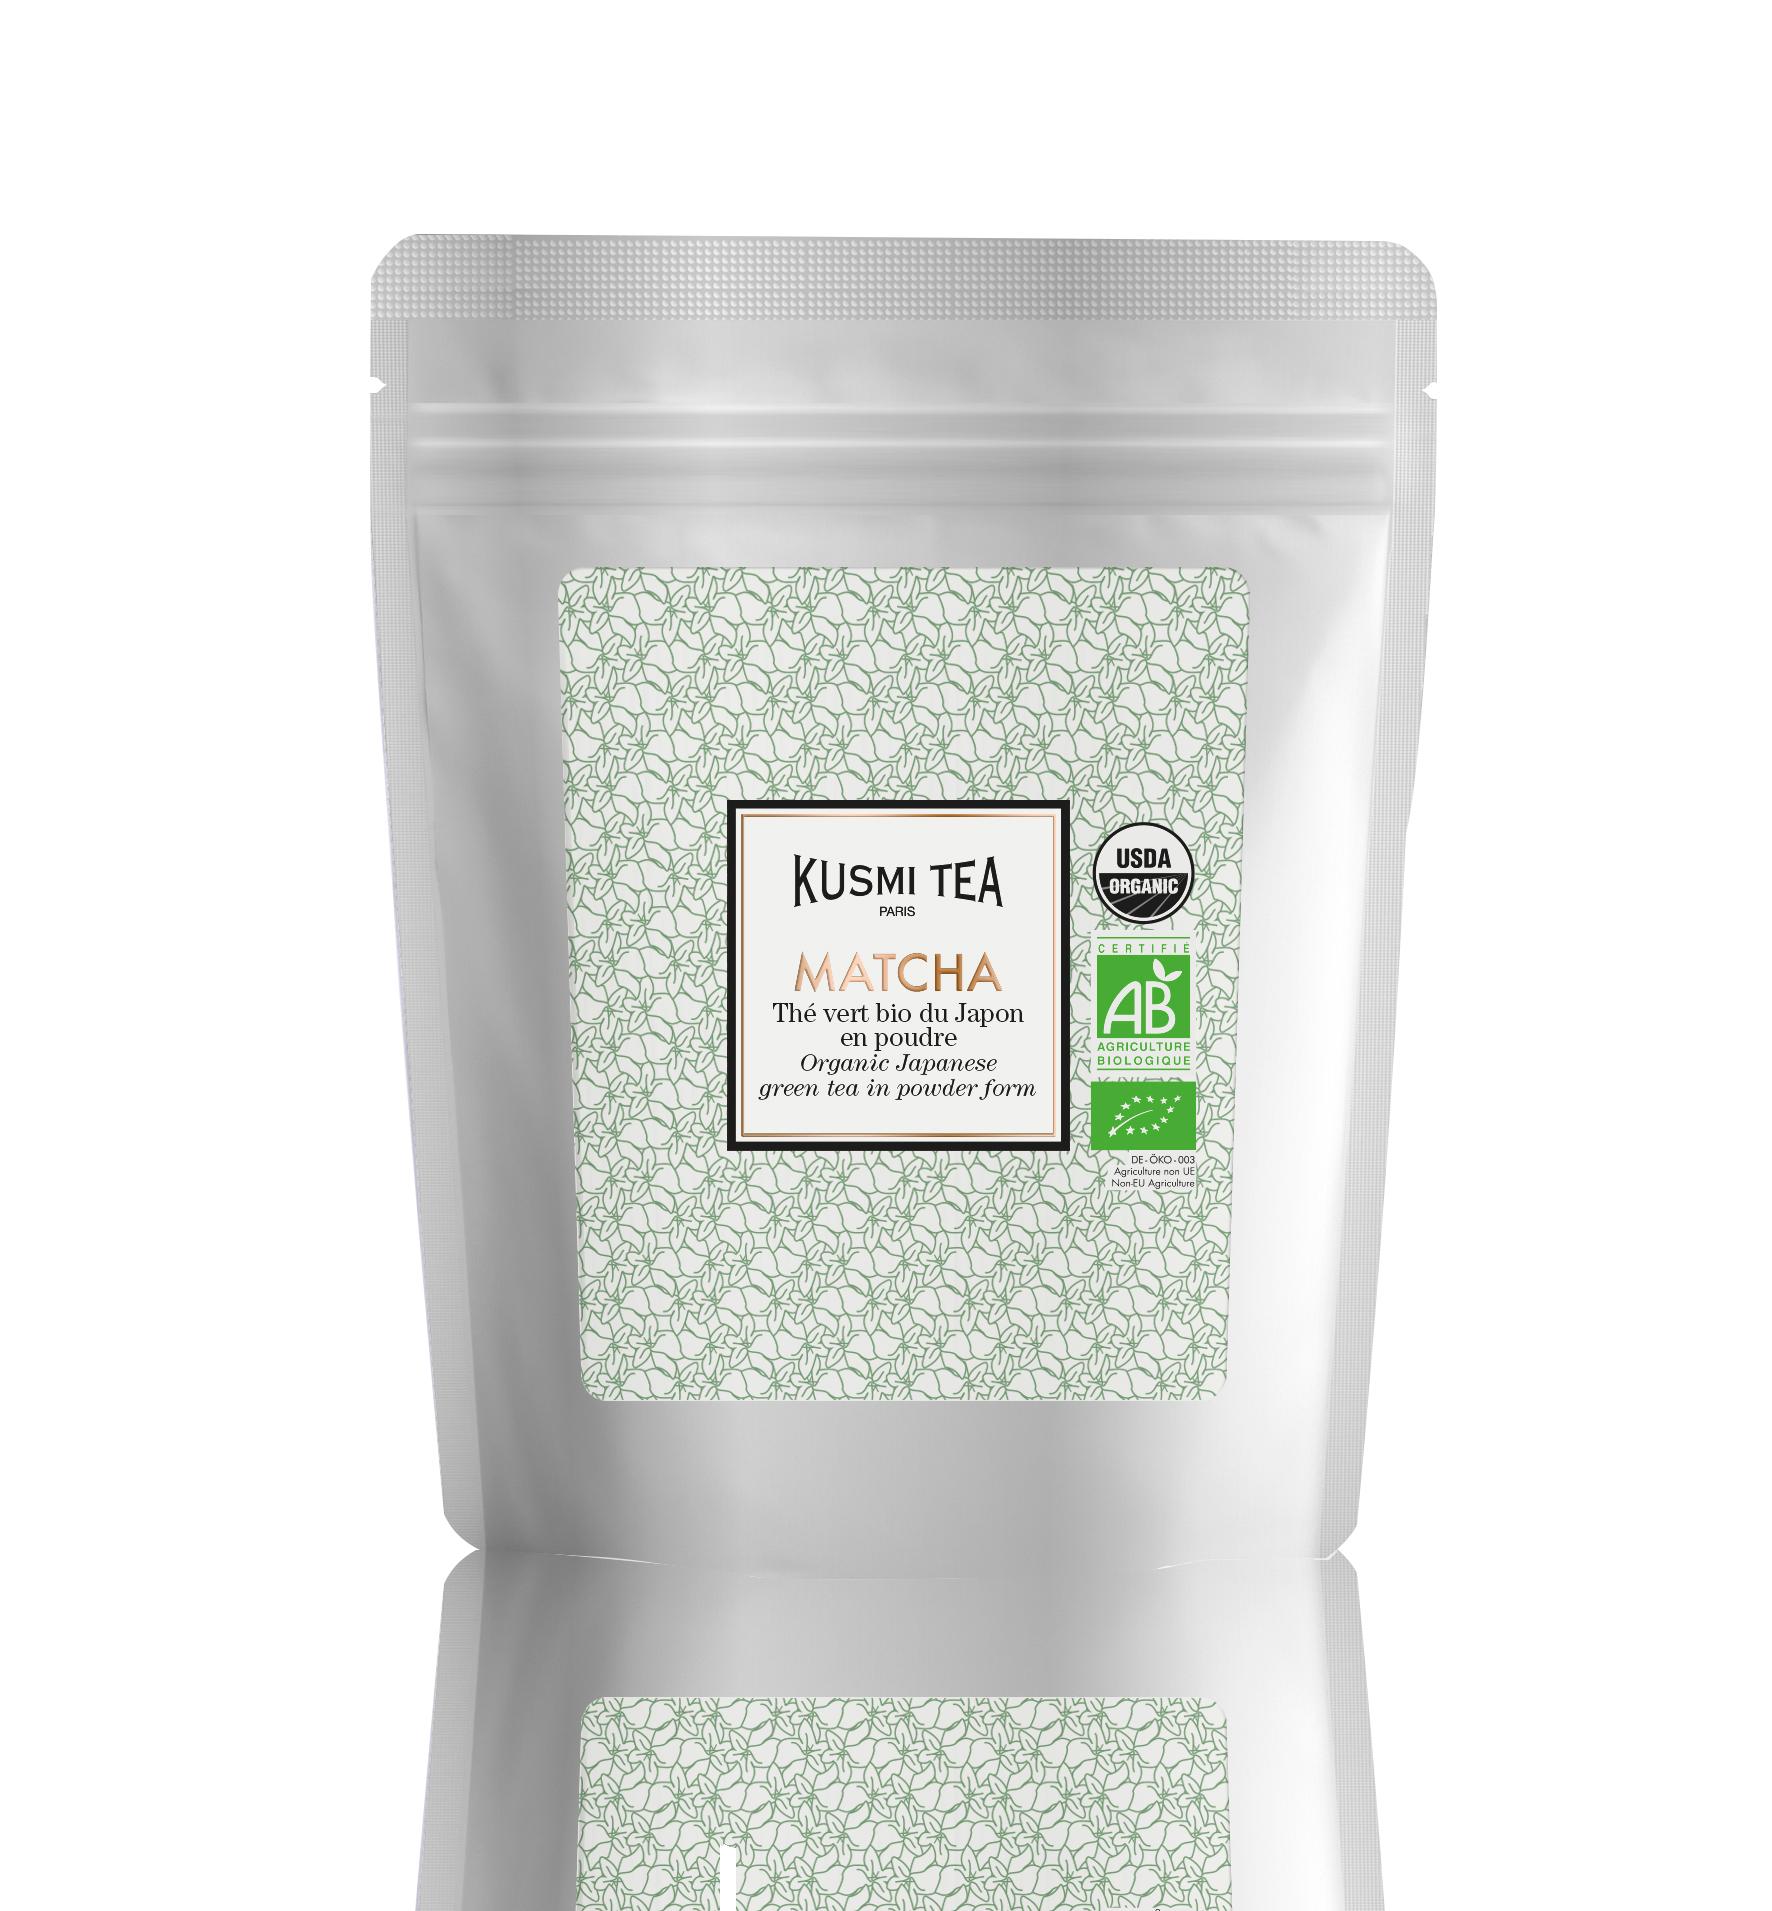 Thé vert - Matcha bio - Vrac - Kusmi Tea